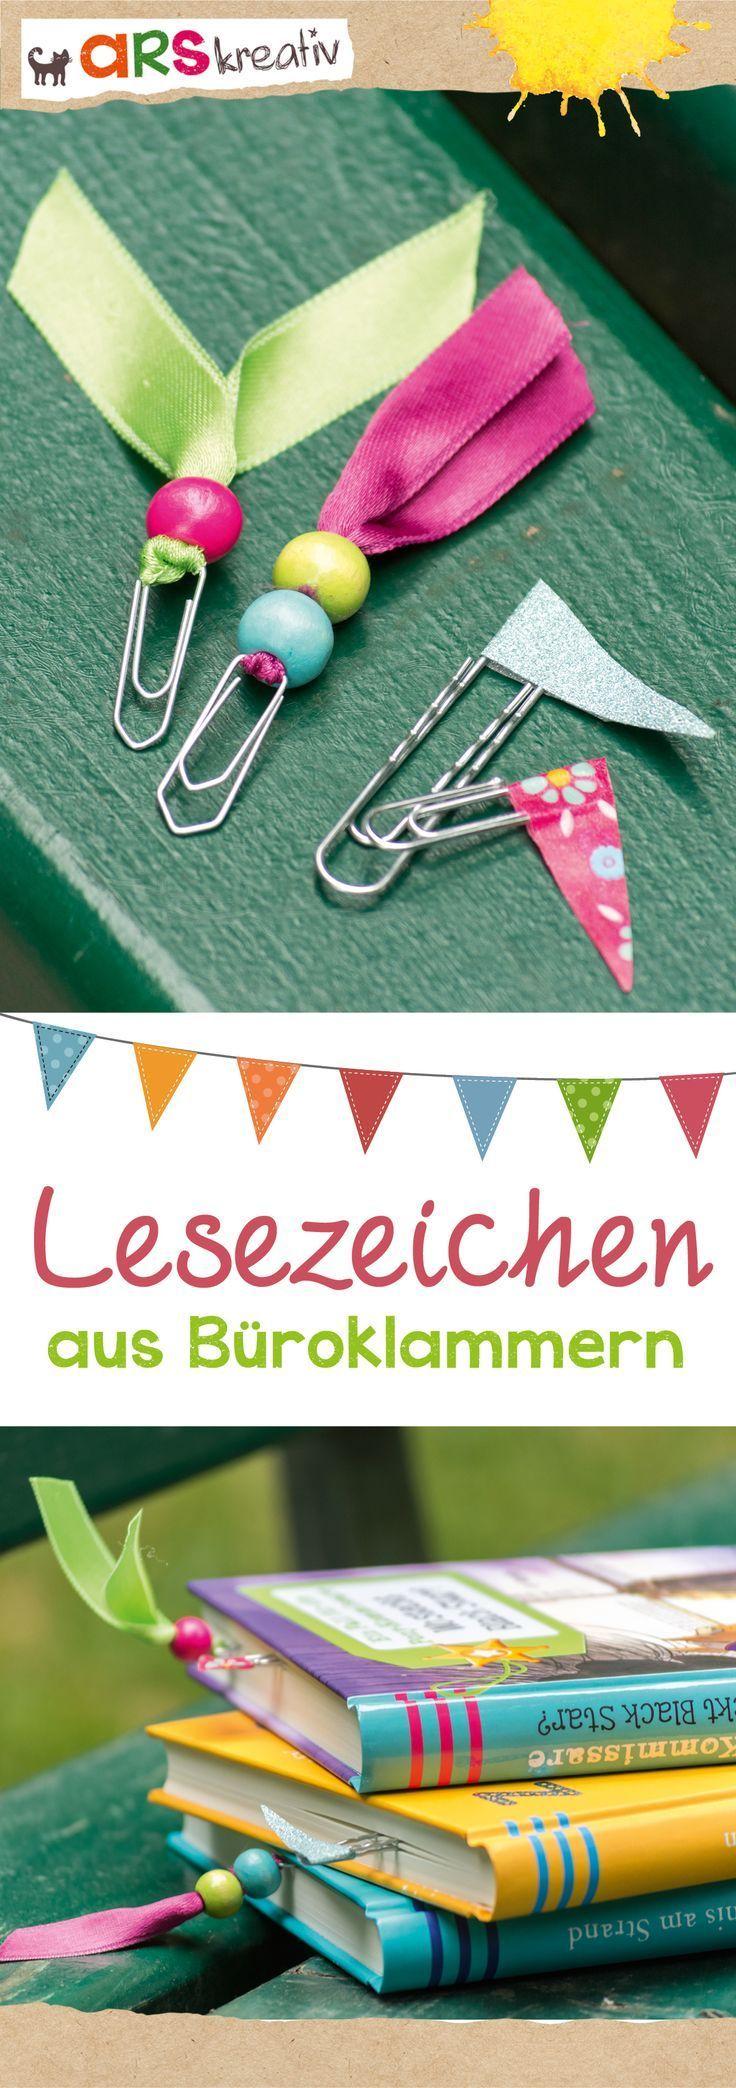 best 25 book markers ideas on pinterest book marks diy kids book marks and bookmarks. Black Bedroom Furniture Sets. Home Design Ideas